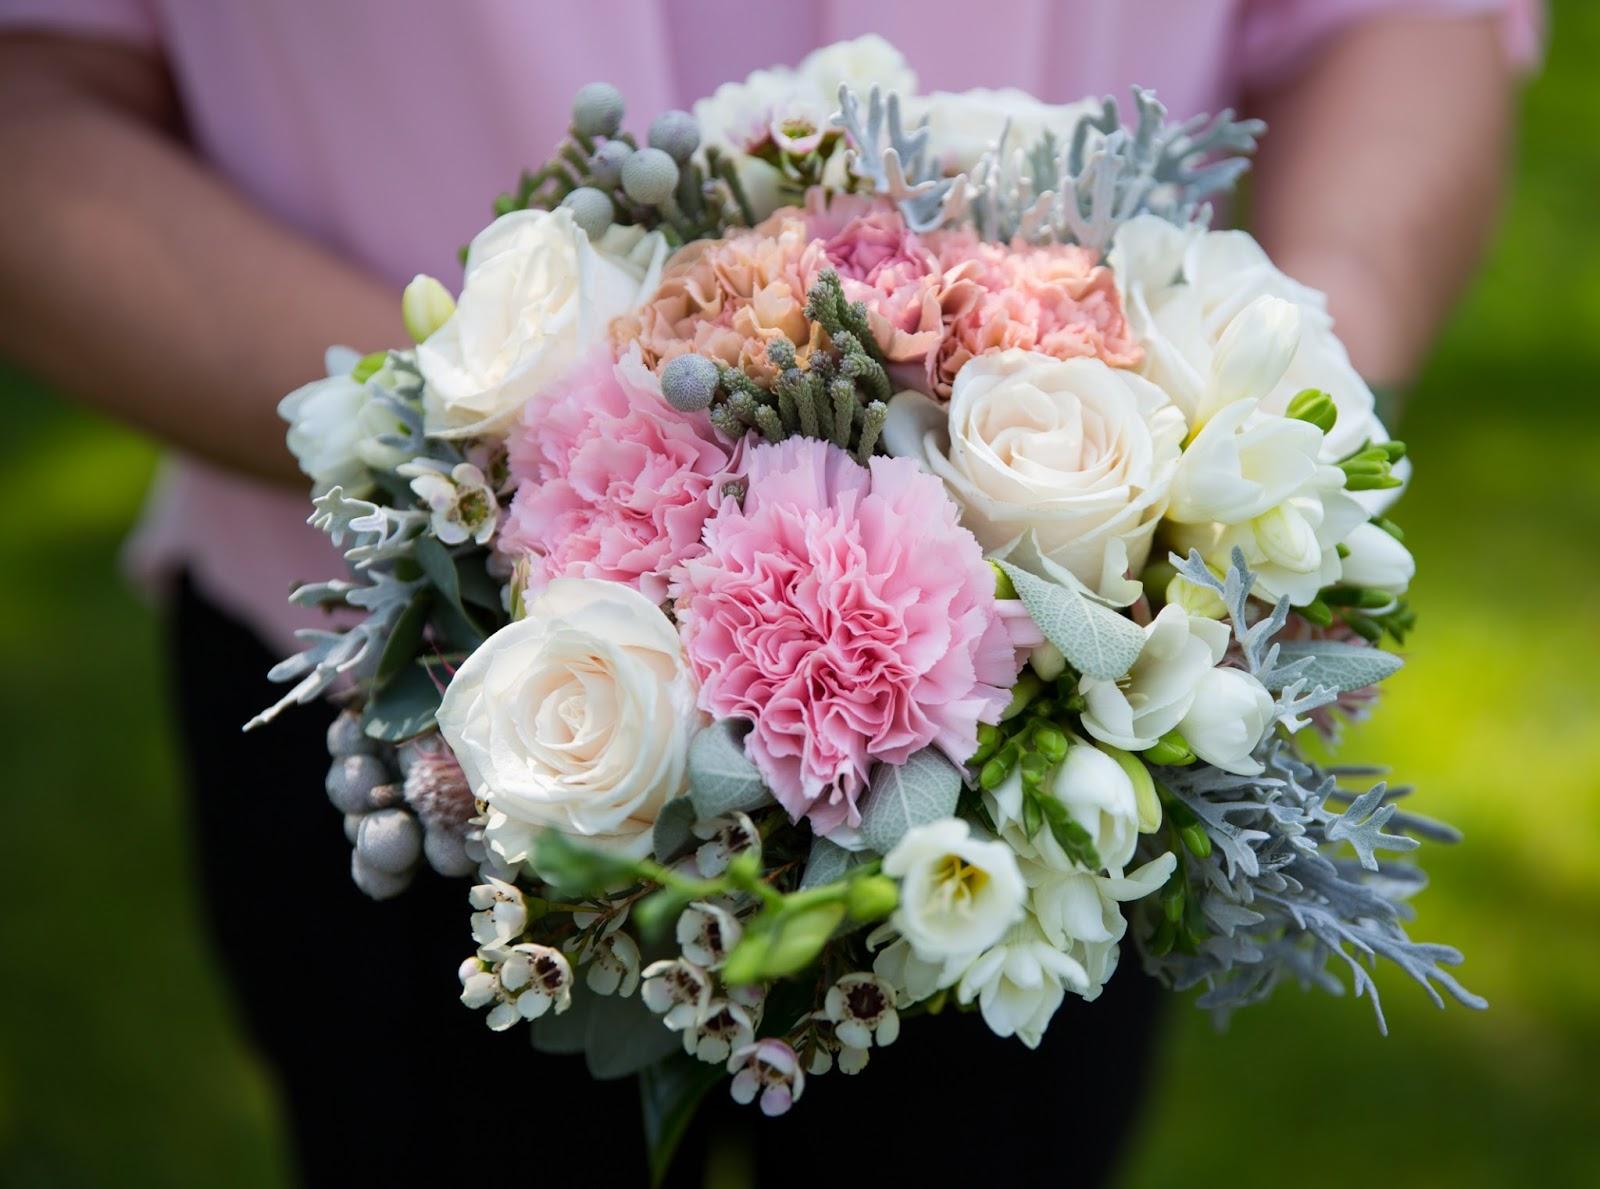 Bouquet sposa rosa e bianco